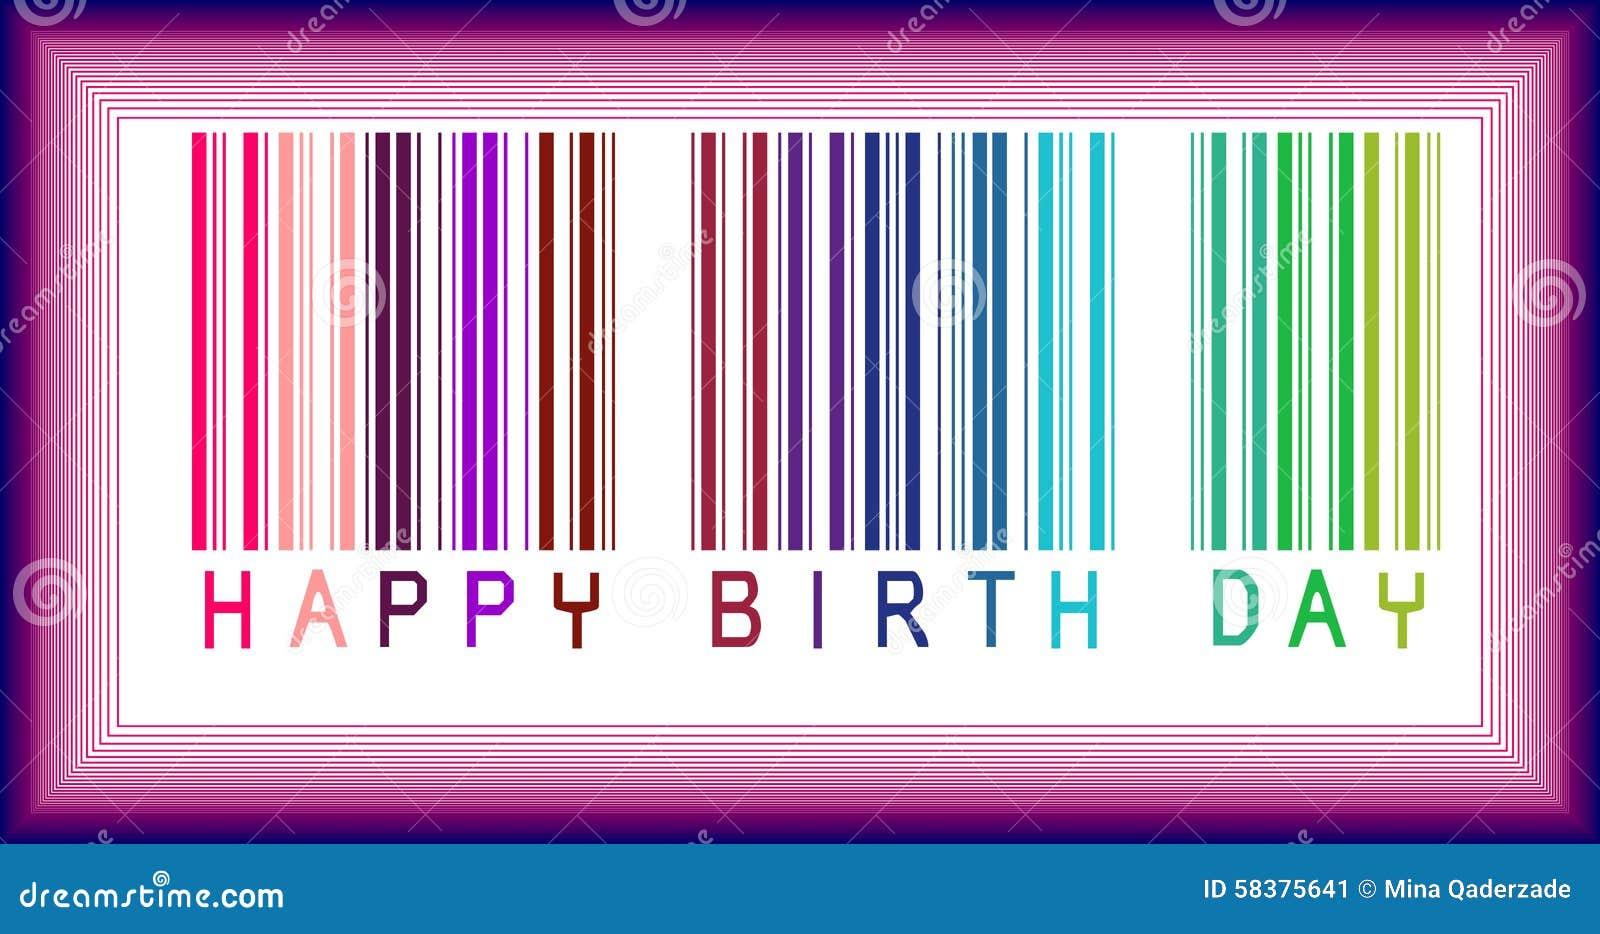 Happy Birthday Bar-code is Happy Birthday phrase in bar-code style.